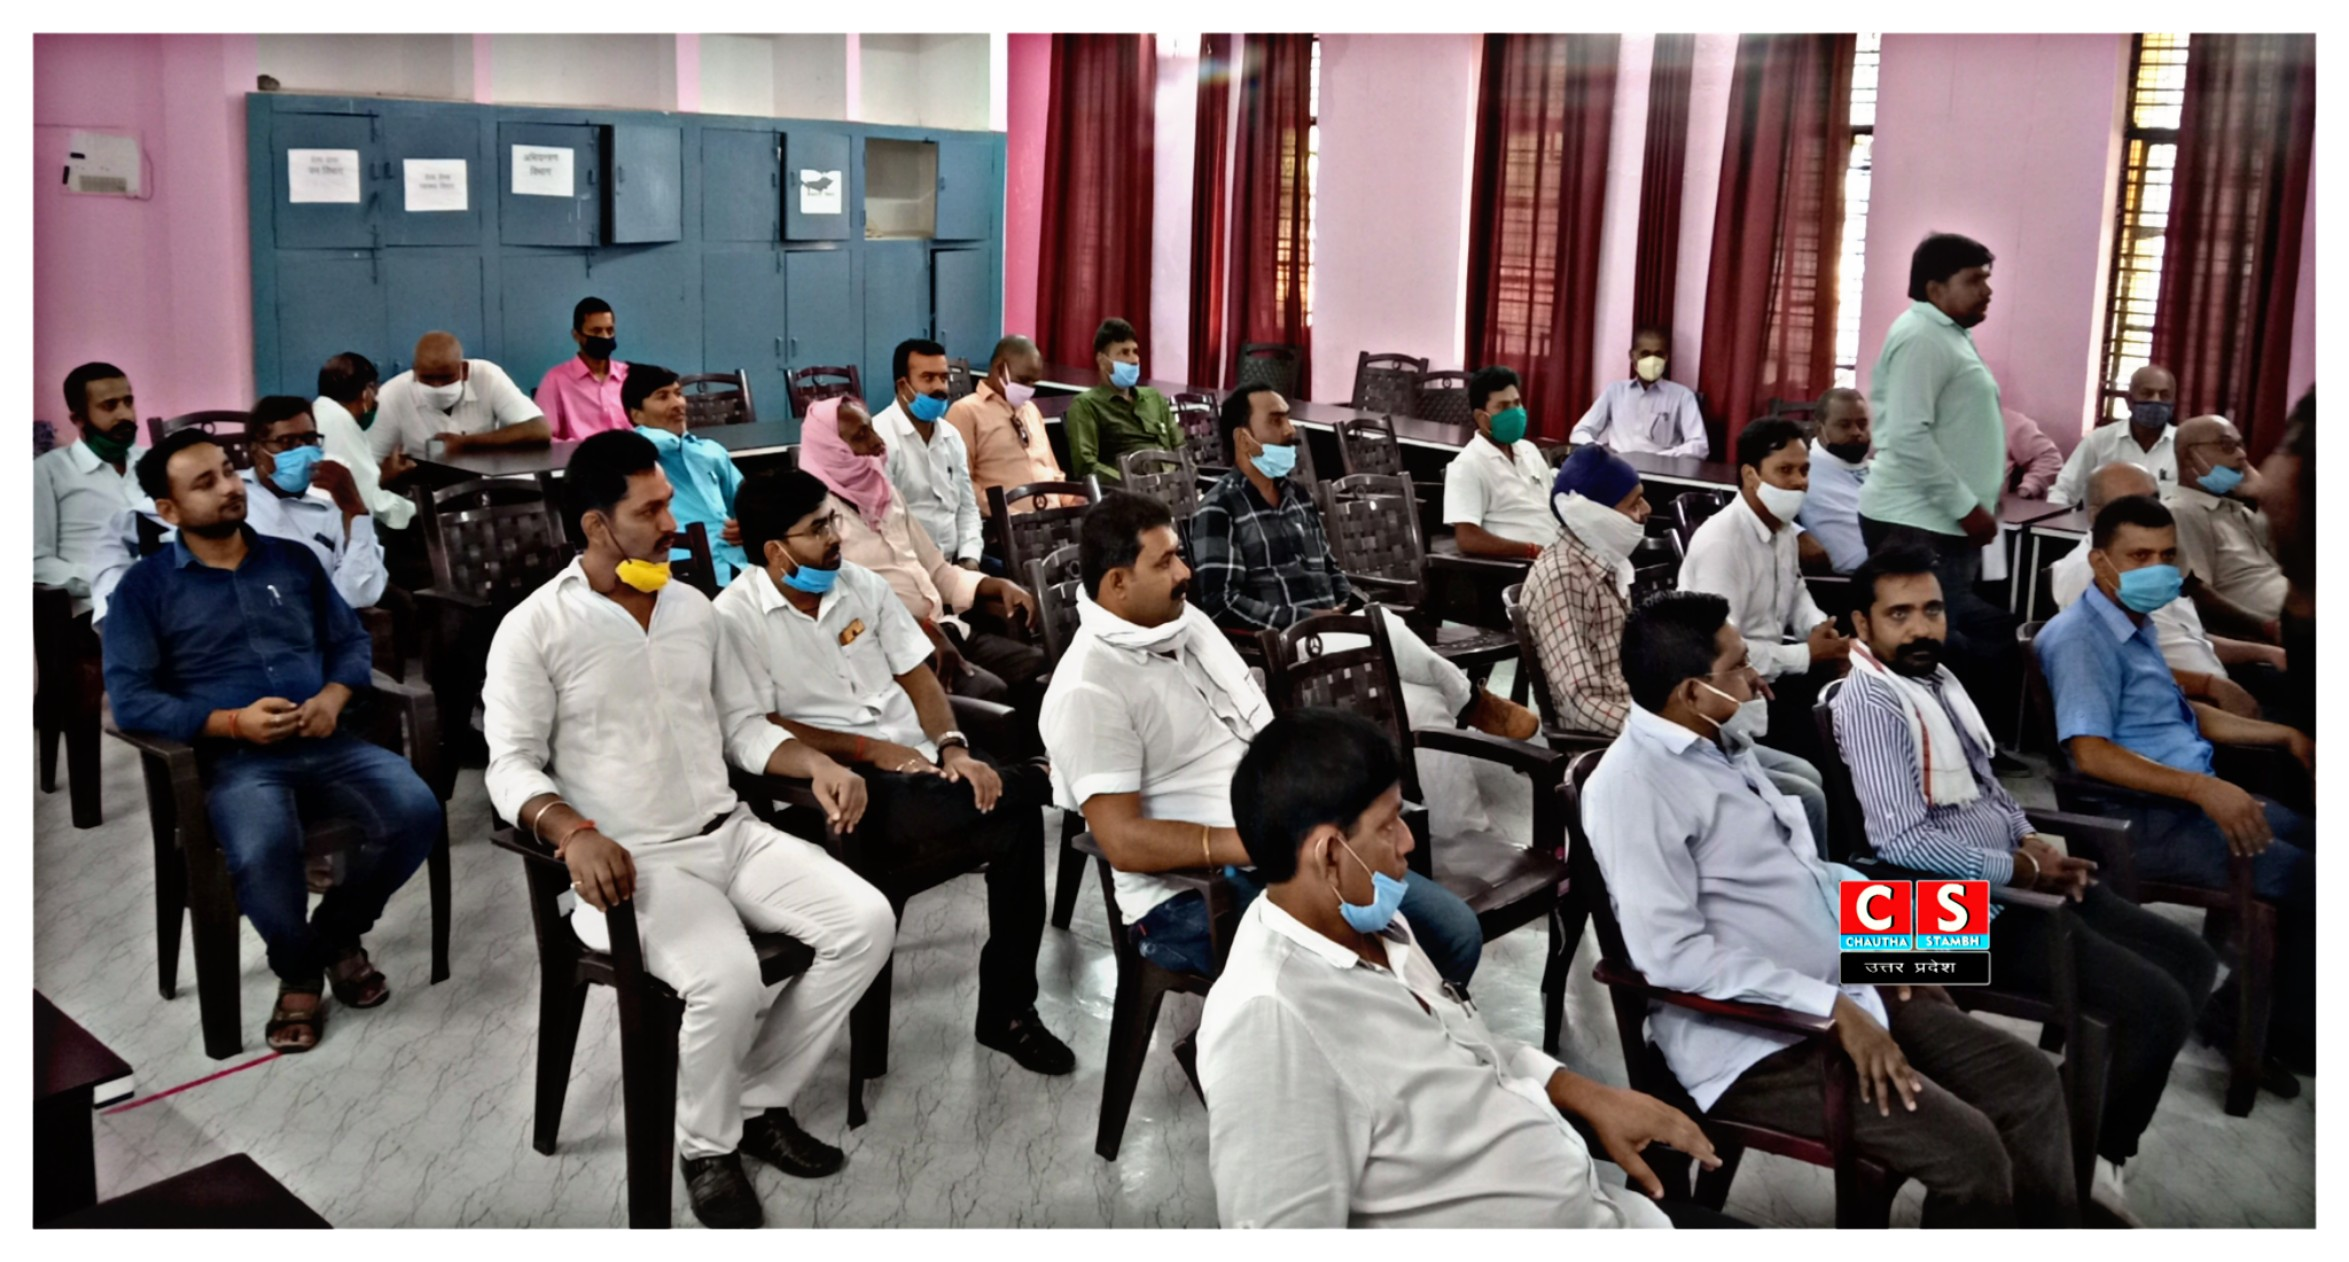 #Swearing_in_ceremony_of_Revenue_Bar_Association_CHAUTHA_STAMBH_News_UttarPradesh2